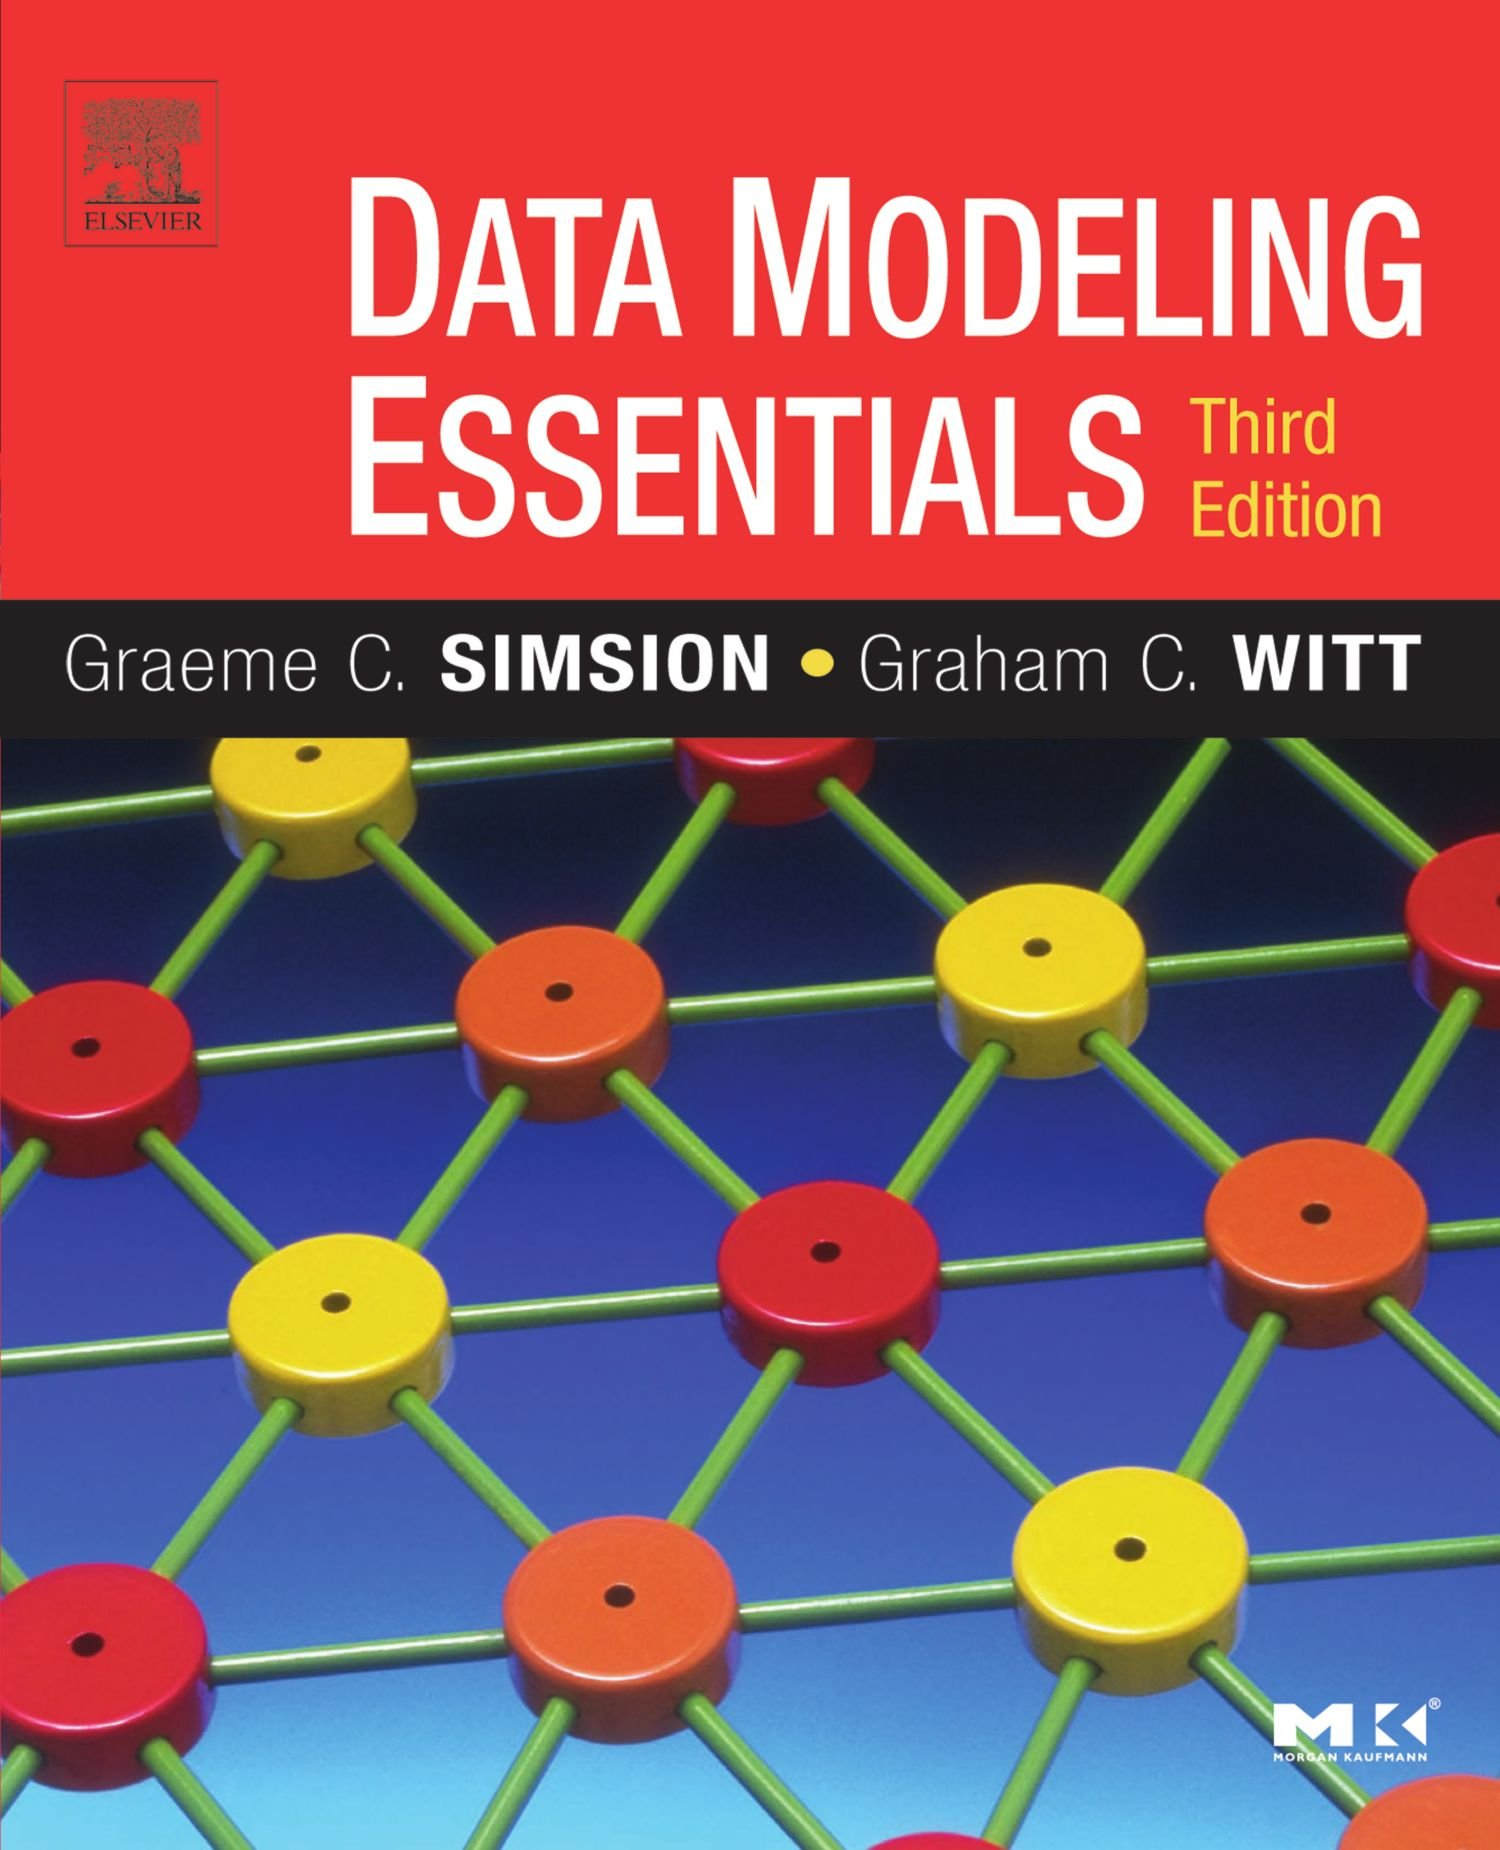 Data Modeling Essentials Third Edition Pdf Download